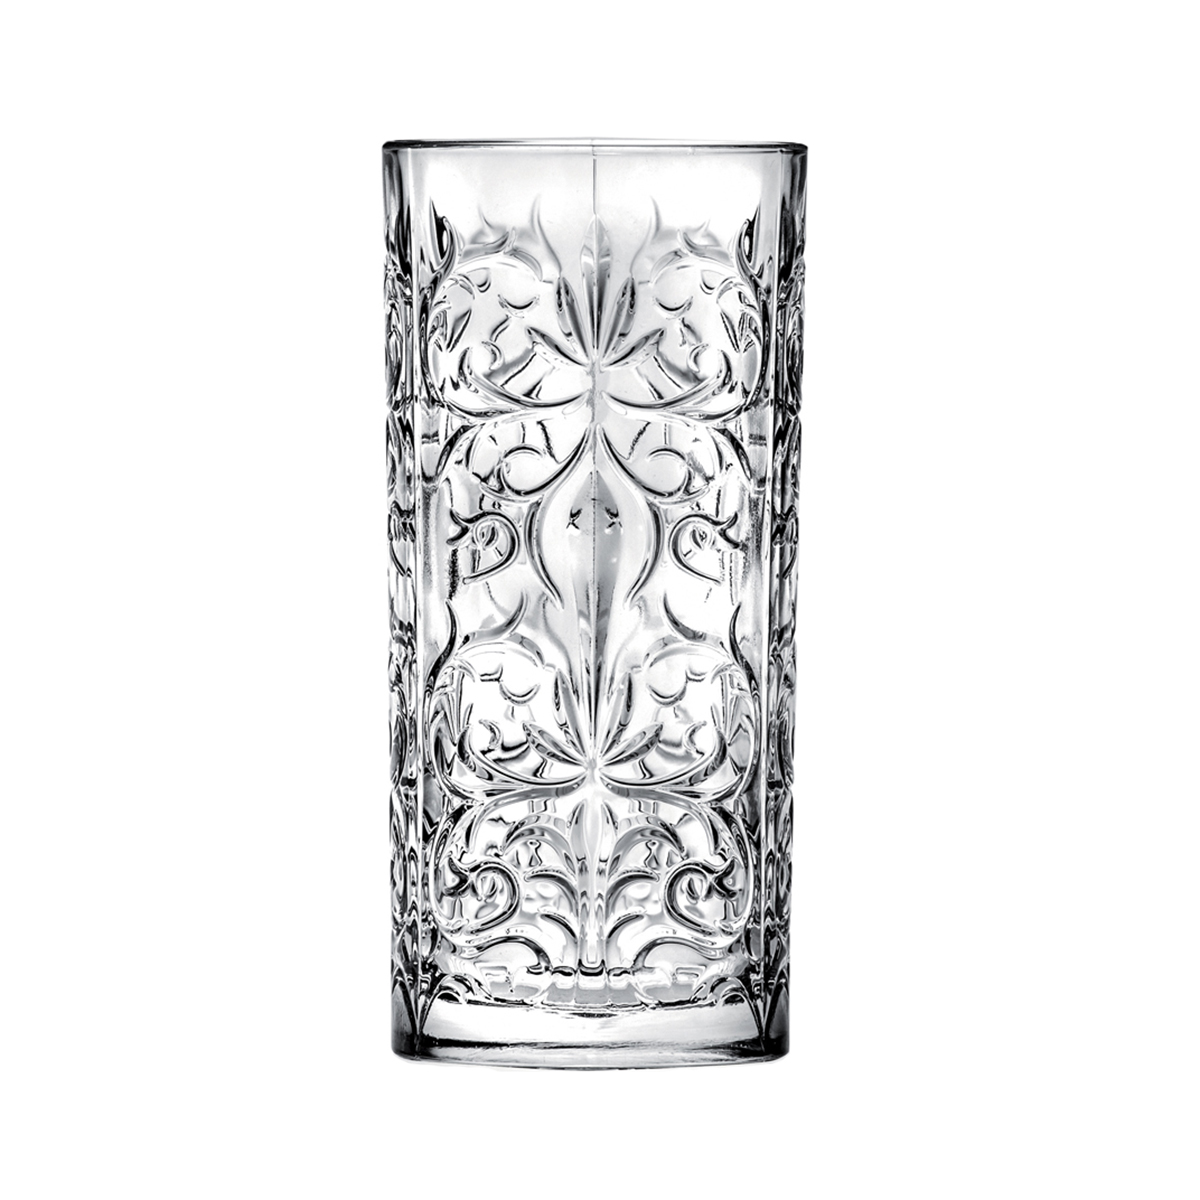 Набор стаканов для воды 360 мл Tattoo RCR (6 шт)